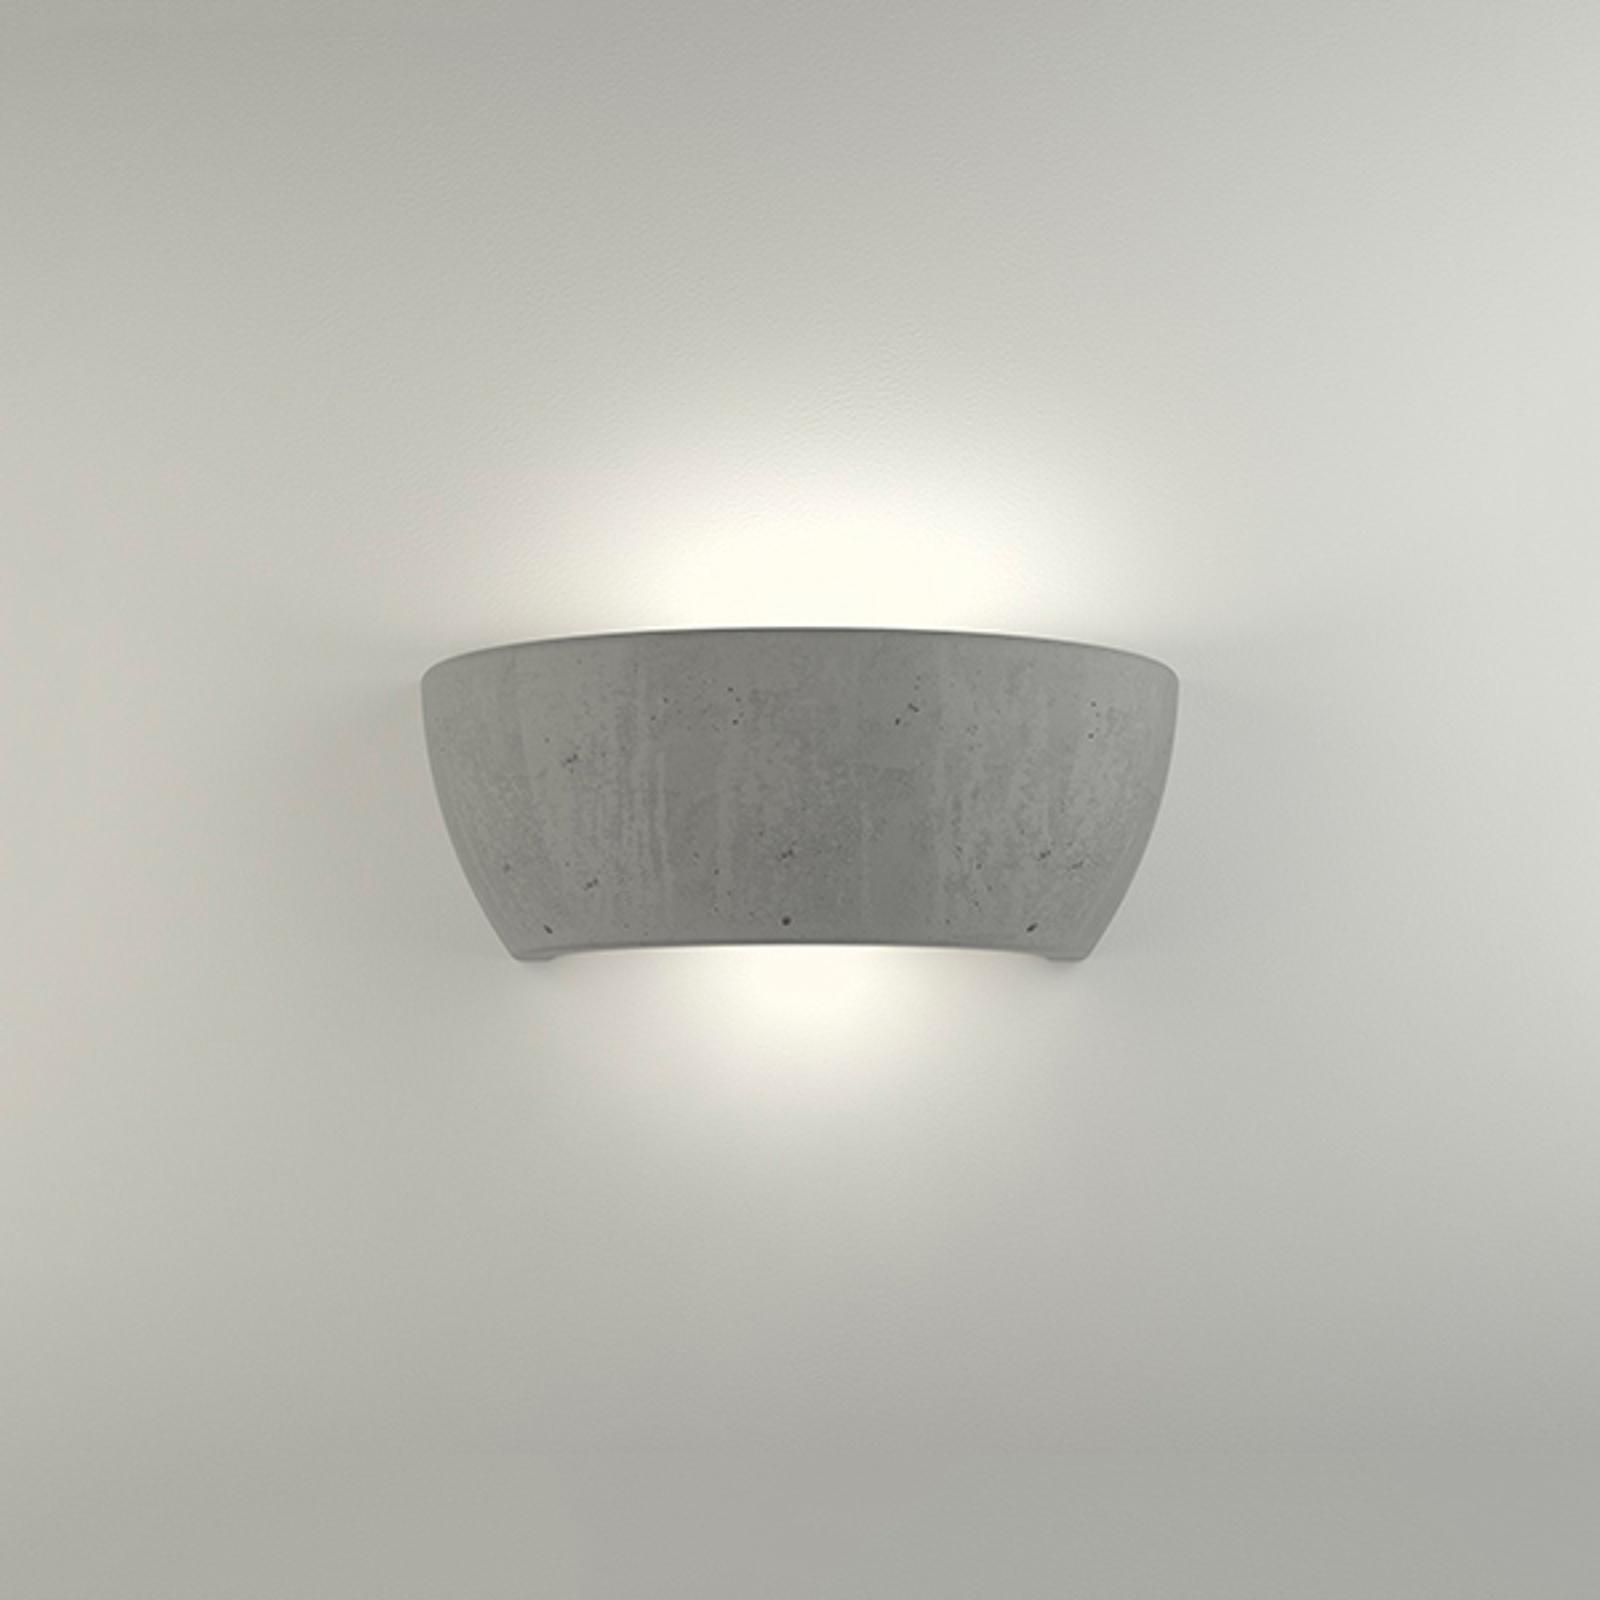 LED-vegglampe 2457 betong 3000K ikke-dimbar